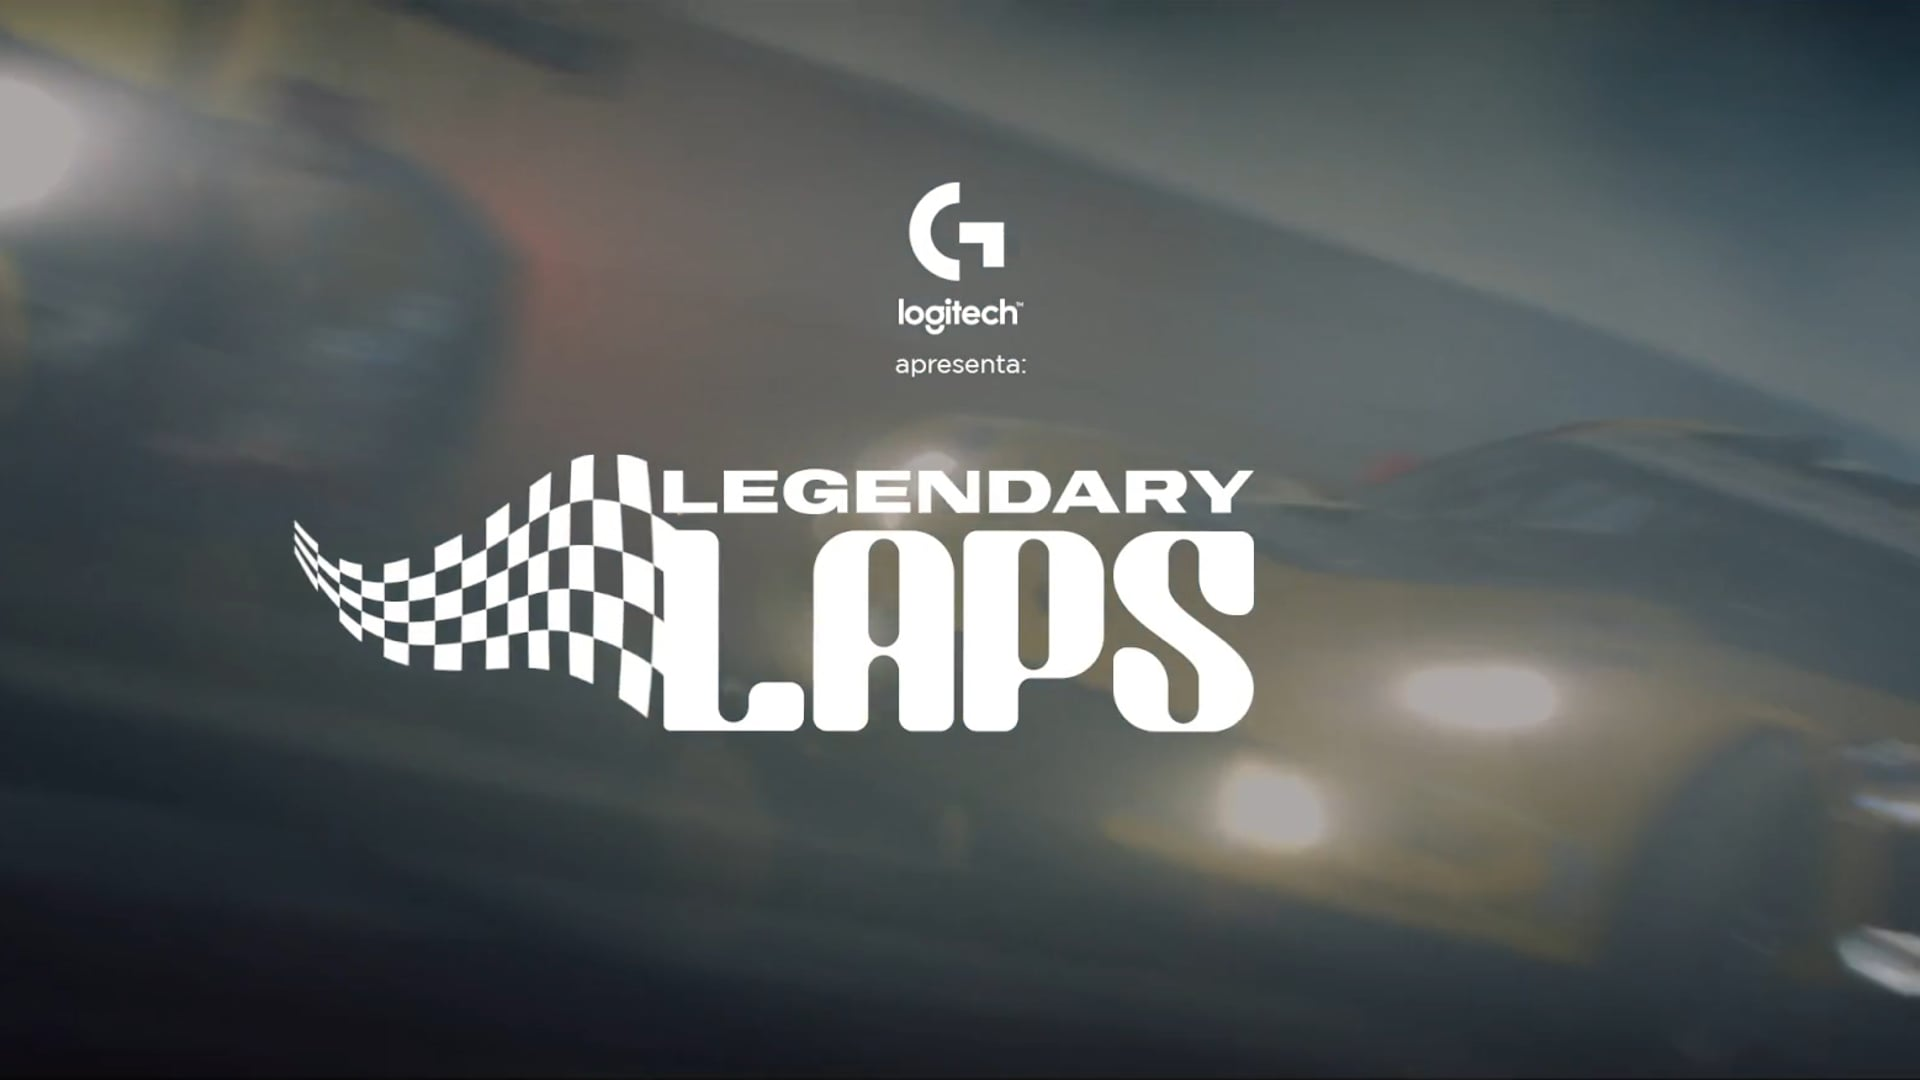 LOGITECH :: Legendary Laps